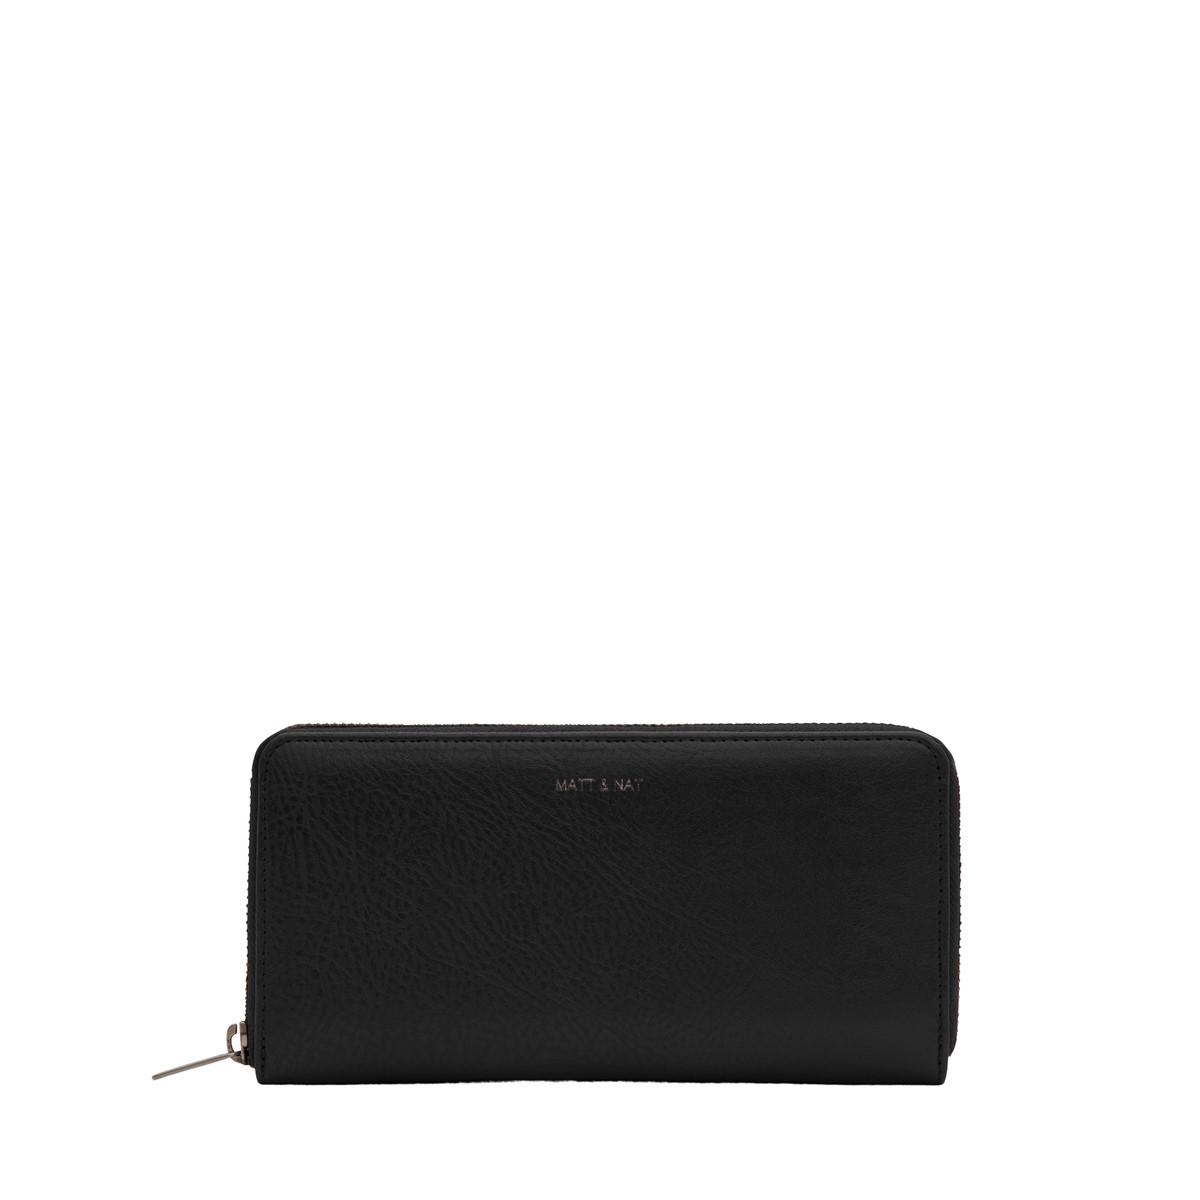 Central Wallet in Black